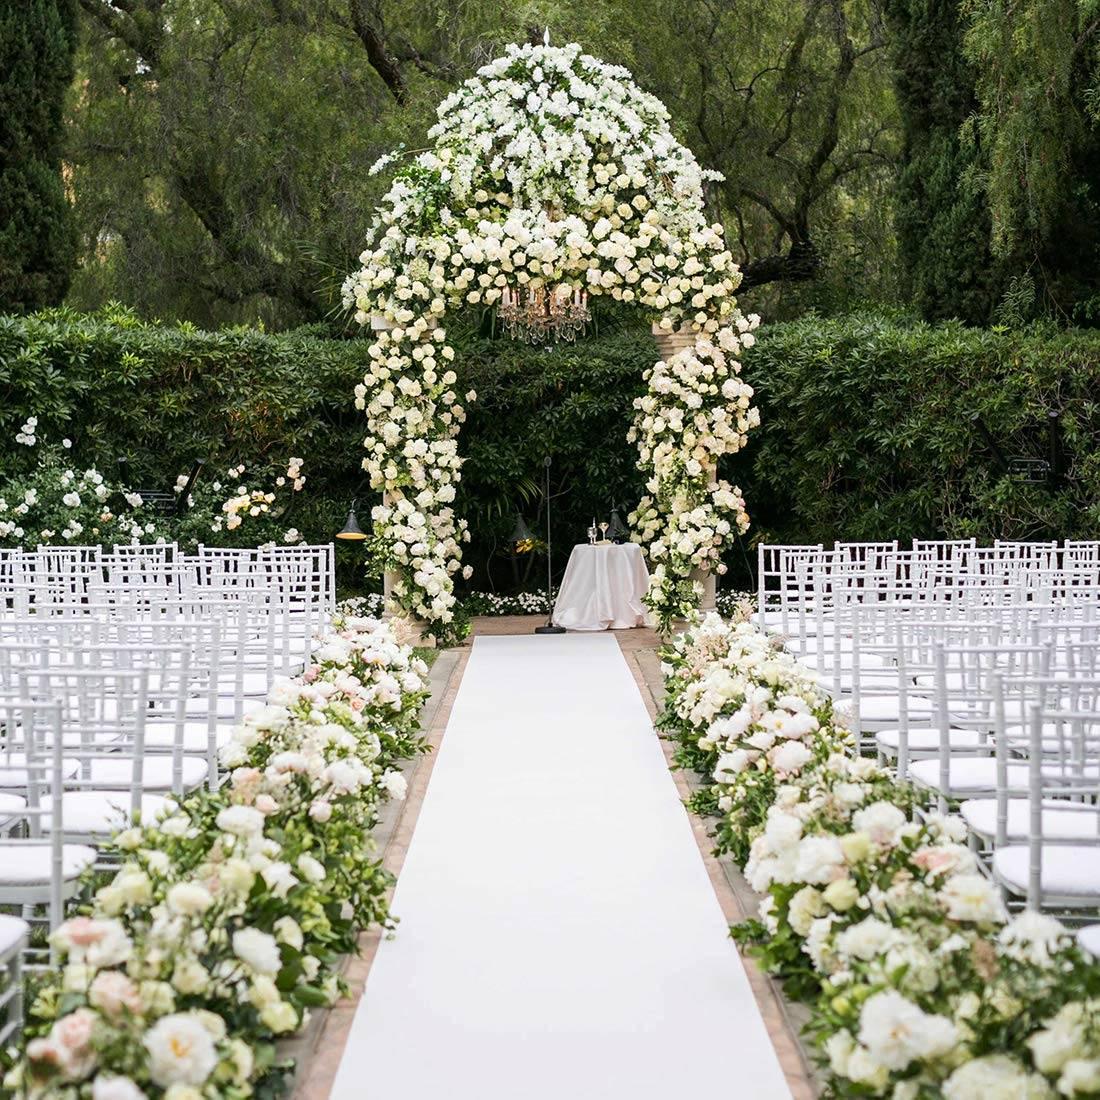 Flower Aisle Wedding: Best Wedding Aisle Runner Ideas For 2020: Pick The Perfect